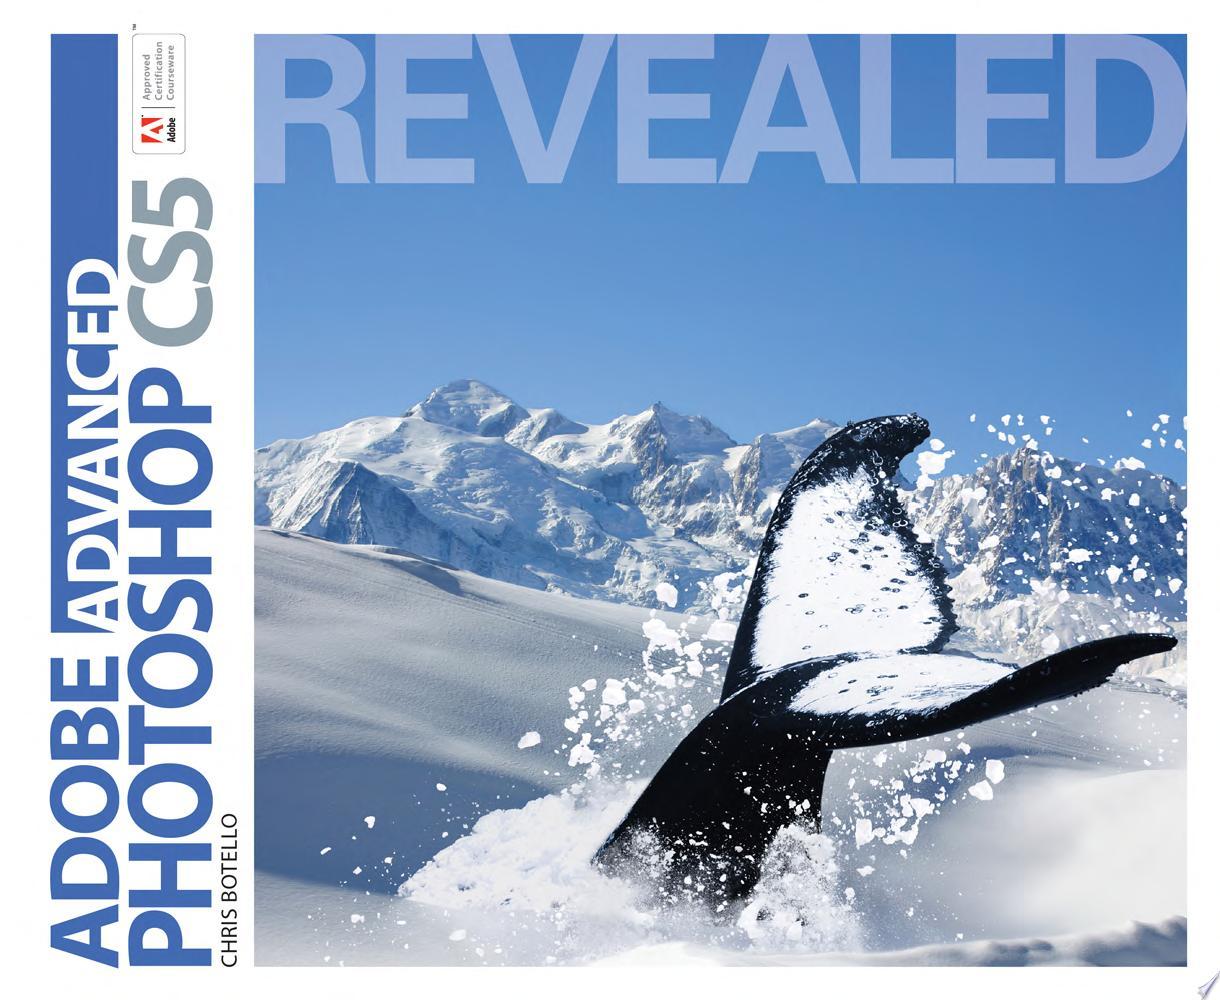 Advanced Adobe Photoshop CS5 Revealed